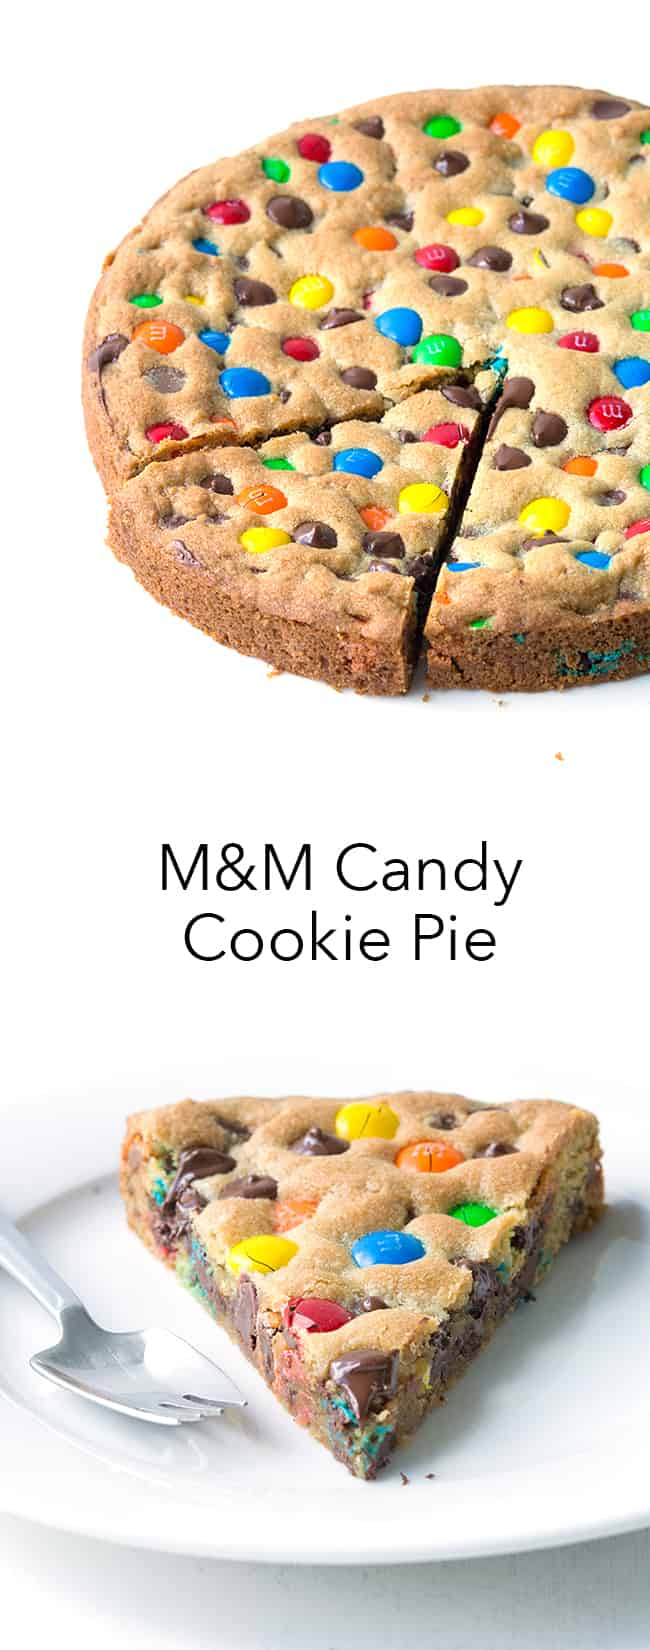 M&M Candy Cookie Pie | Sweetest Menu